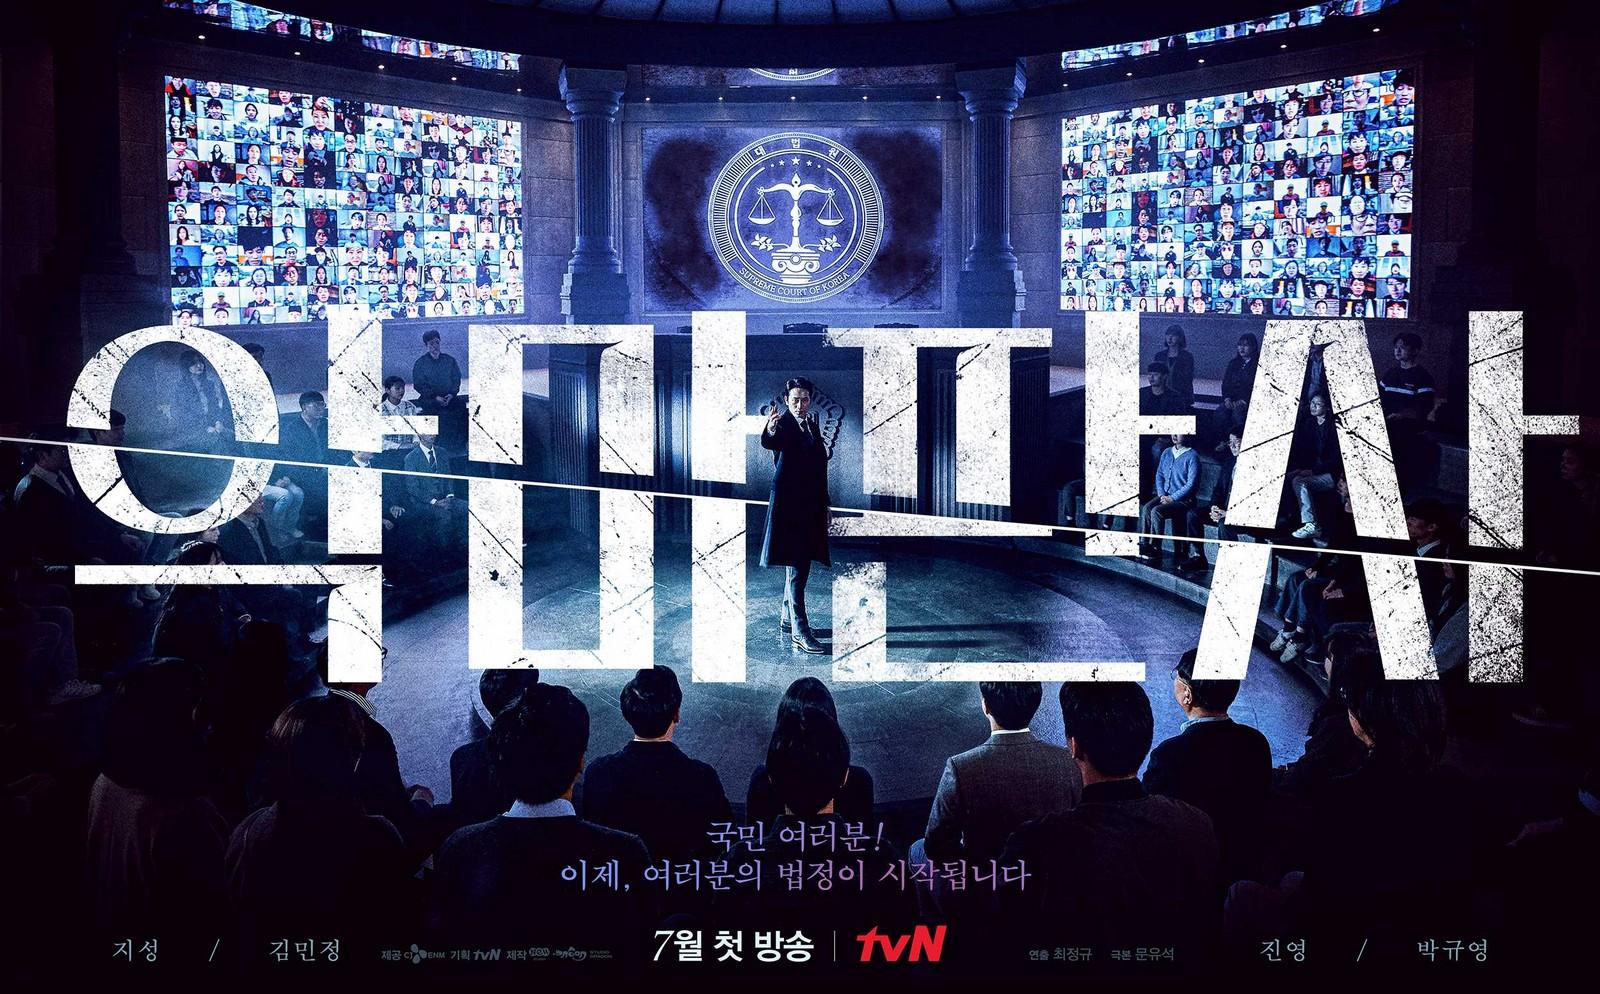 Дьявольский судья / The Devil Judge (2021) Южная Корея